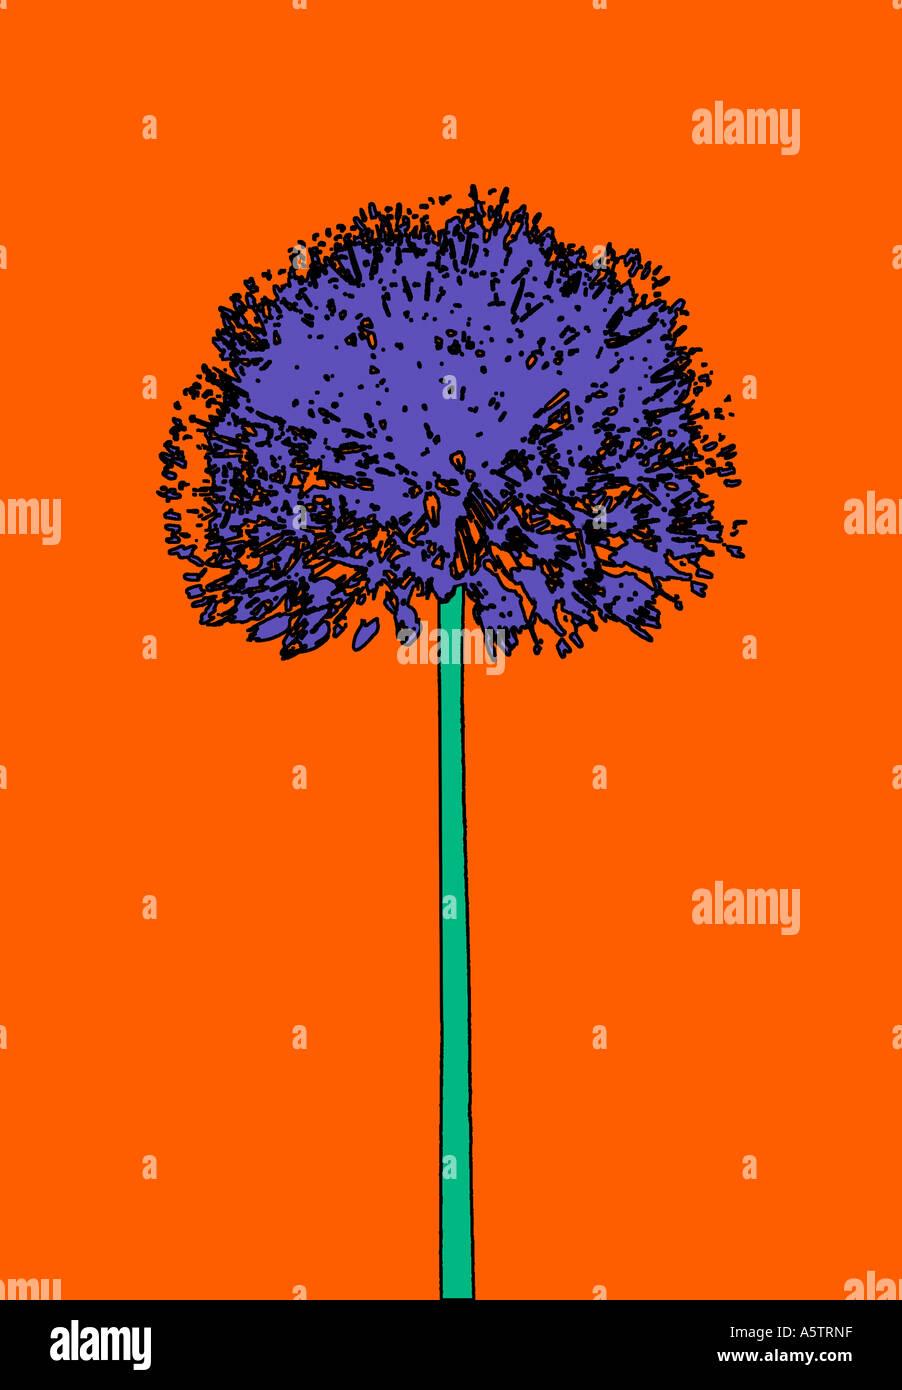 Grafisches Muster - Allium Abbildung Stockfoto